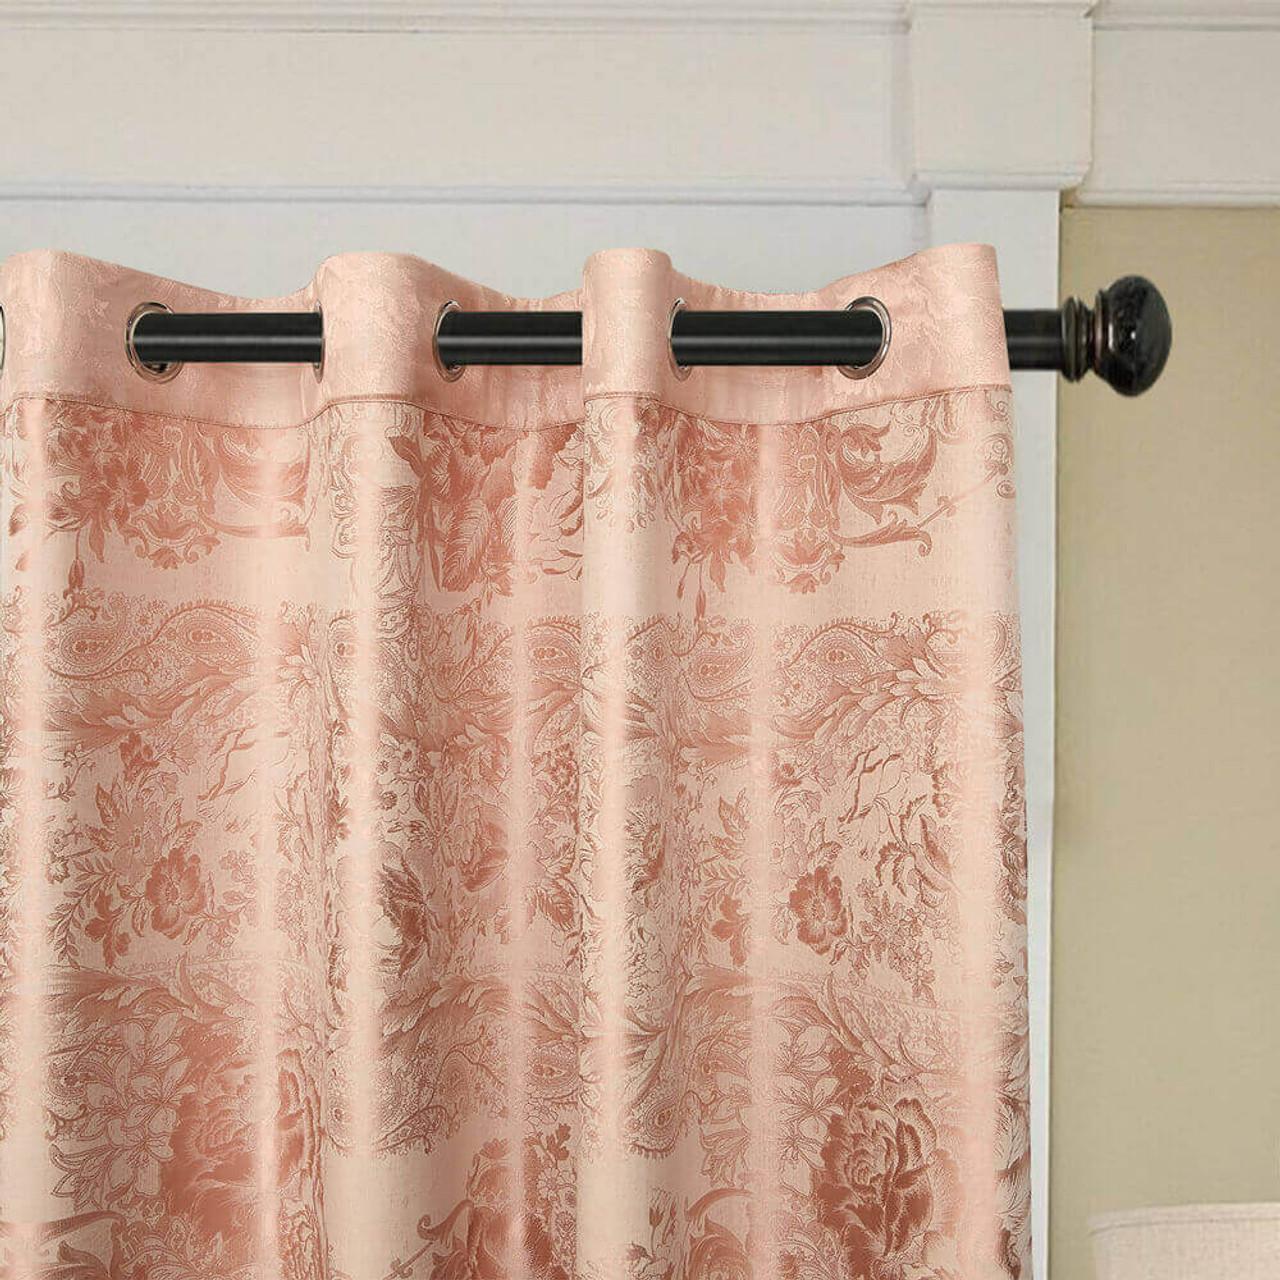 Curtain Panel Semi-Blackout Drapes, DMC717 Dolce Mela Vienna Window Treatments